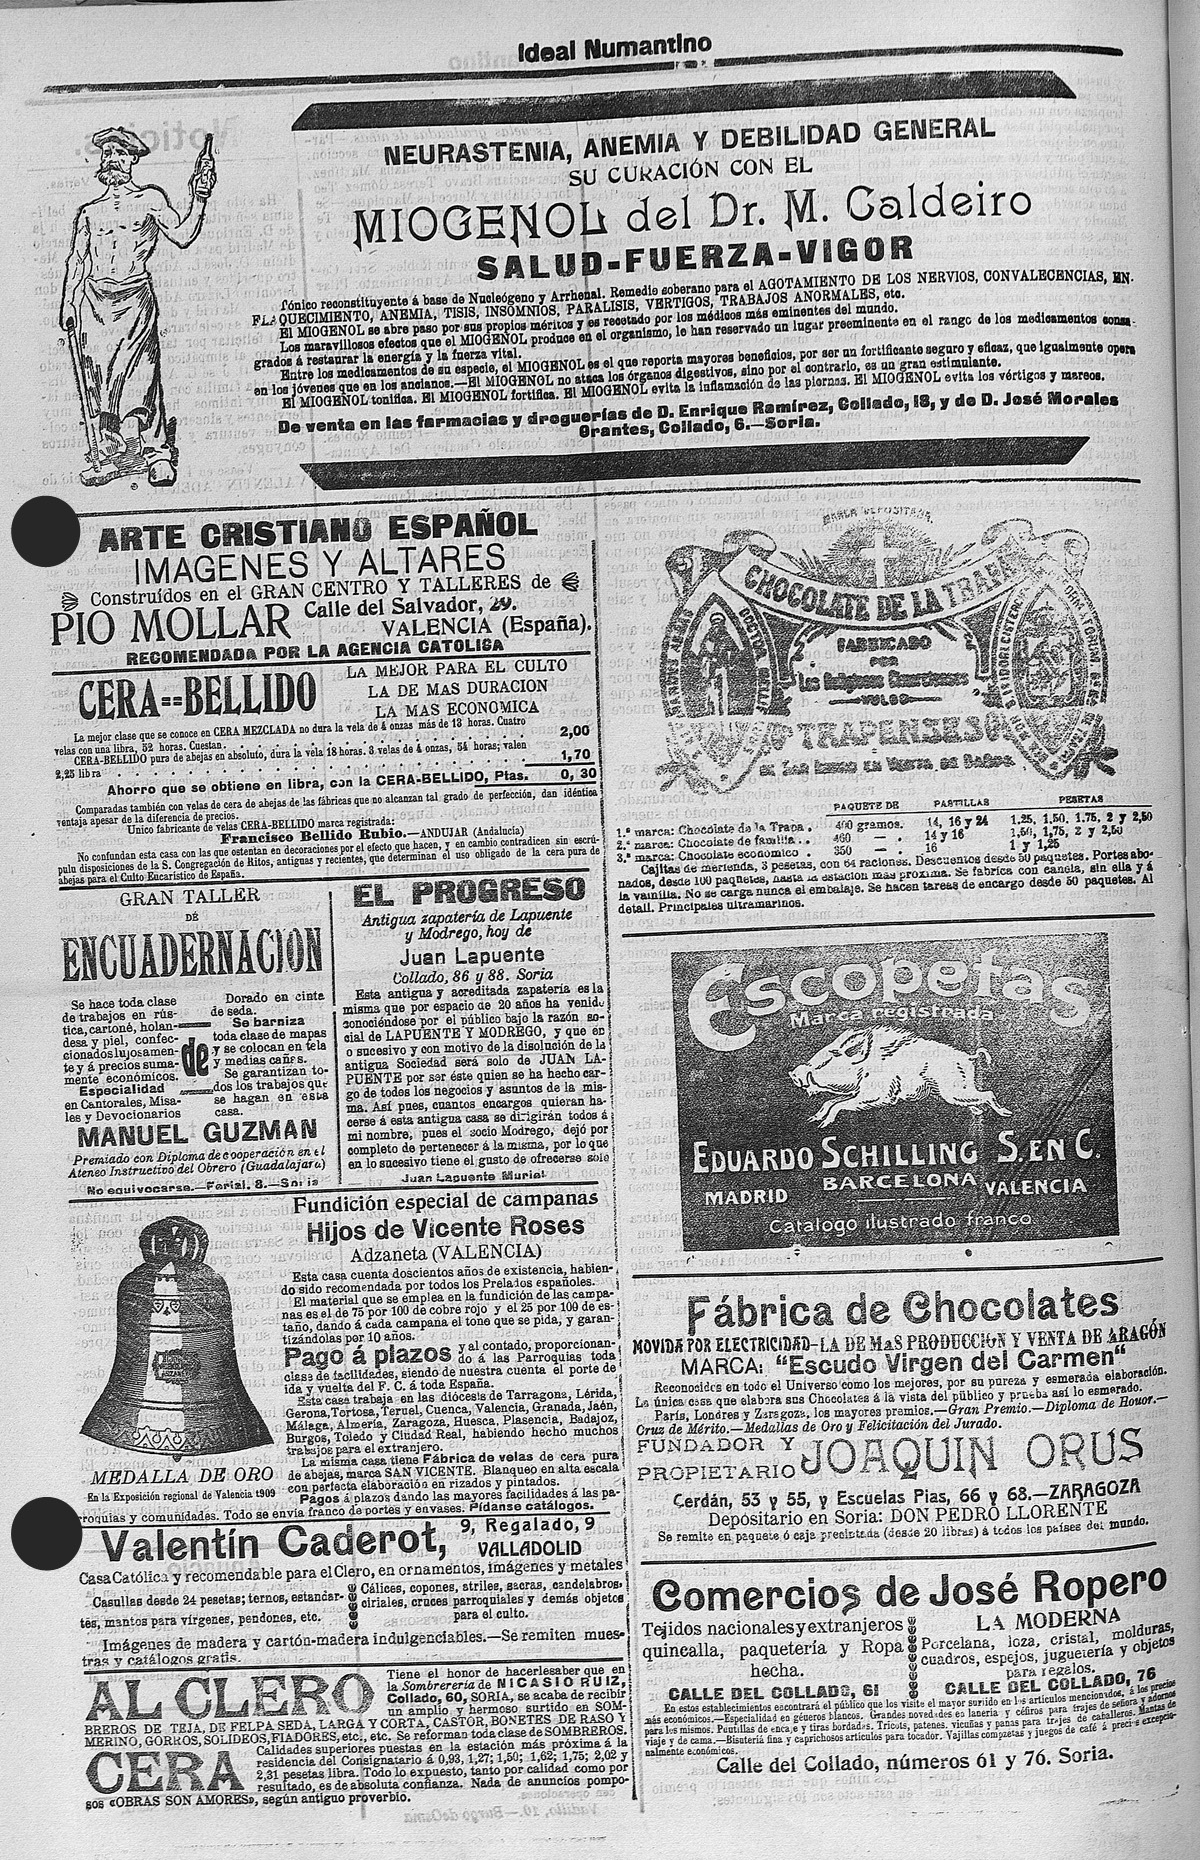 1911-10-04-IdealNumantino